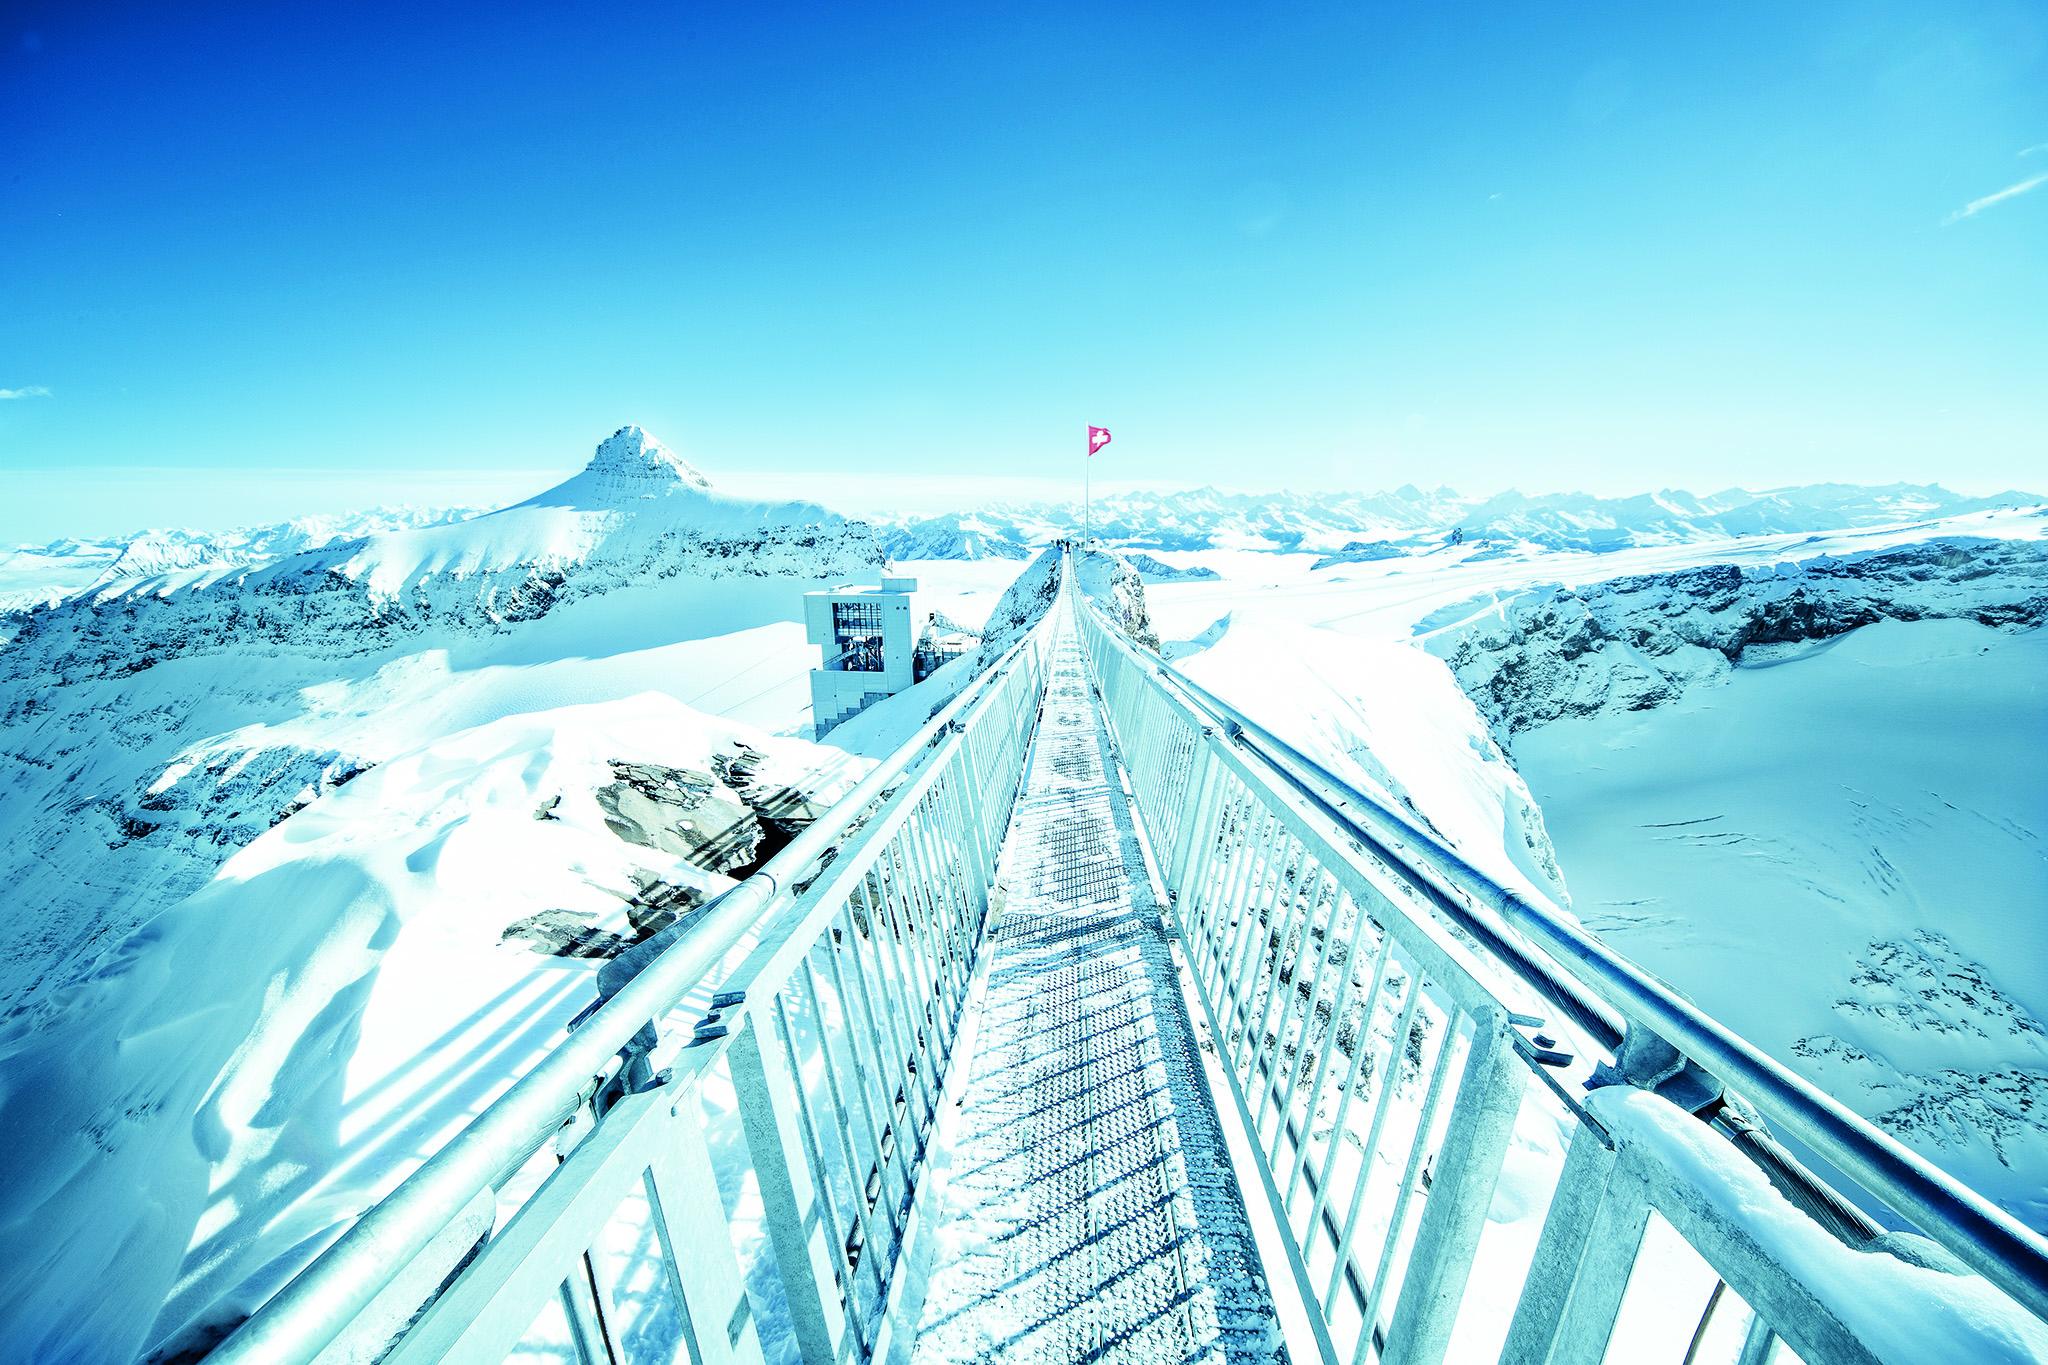 kt_2020_320_Keytours_excursions_Swisstours_glacier3000_peak_walk8_2048_10